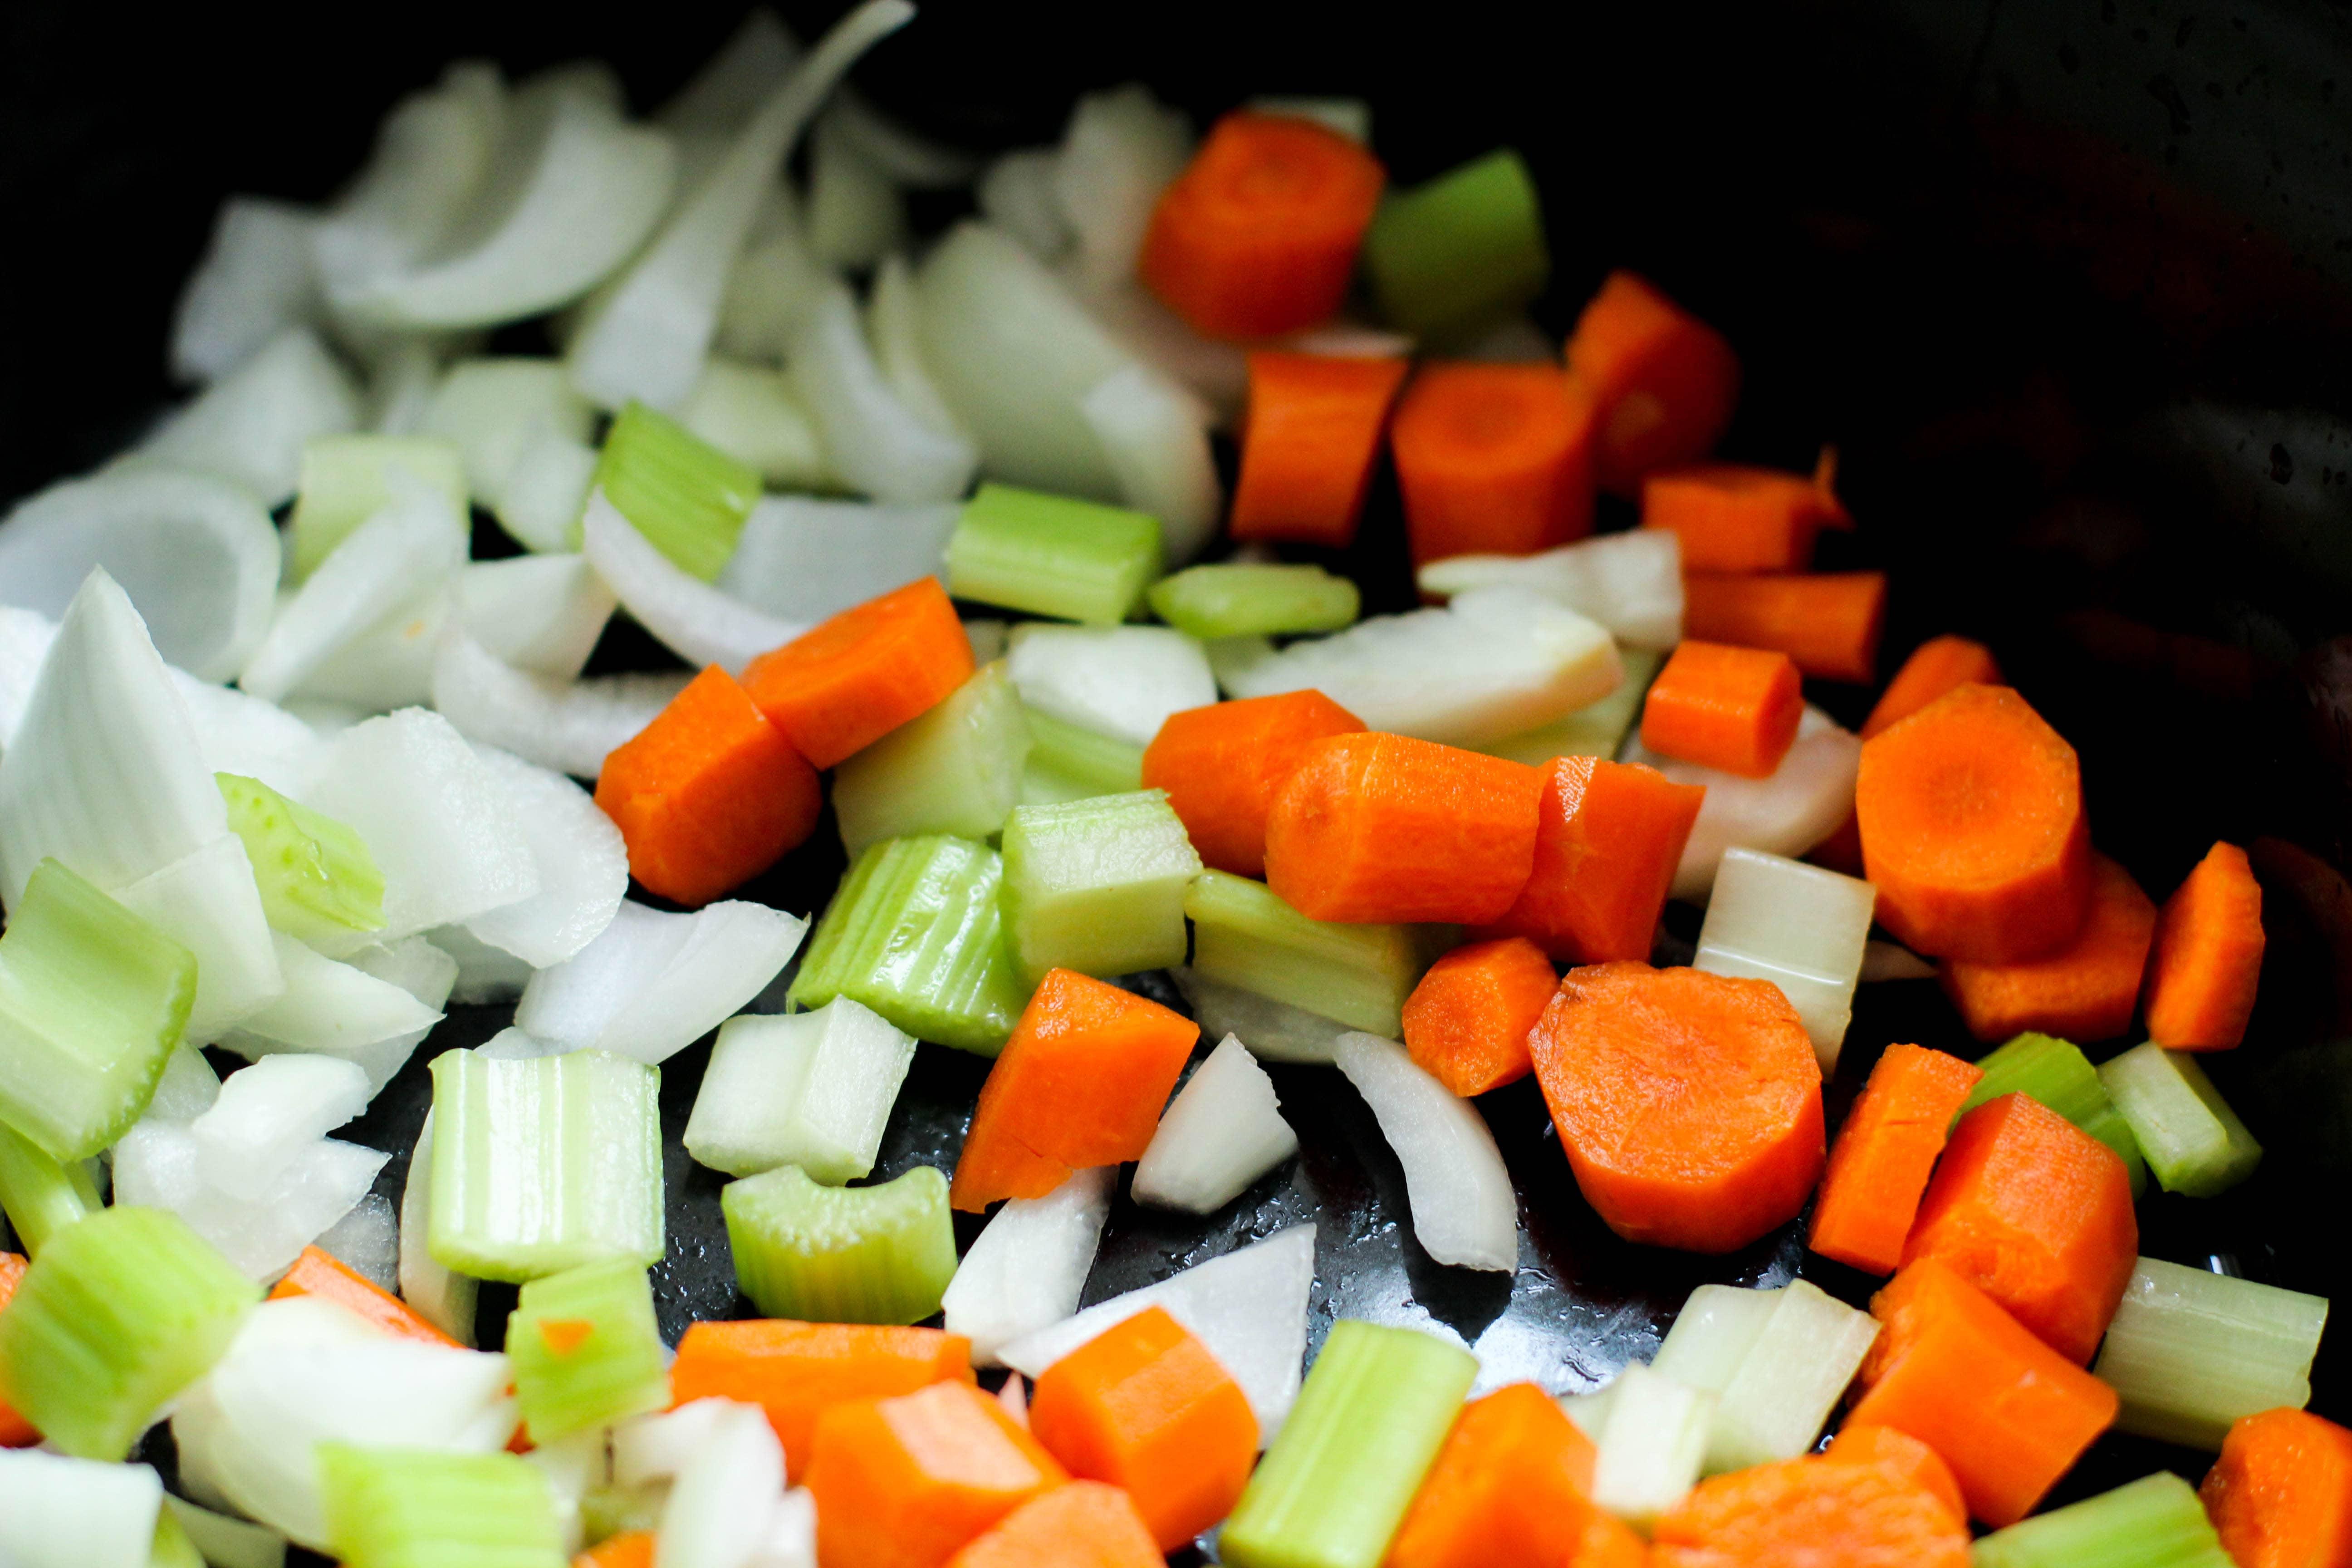 chopped veggies in a pan